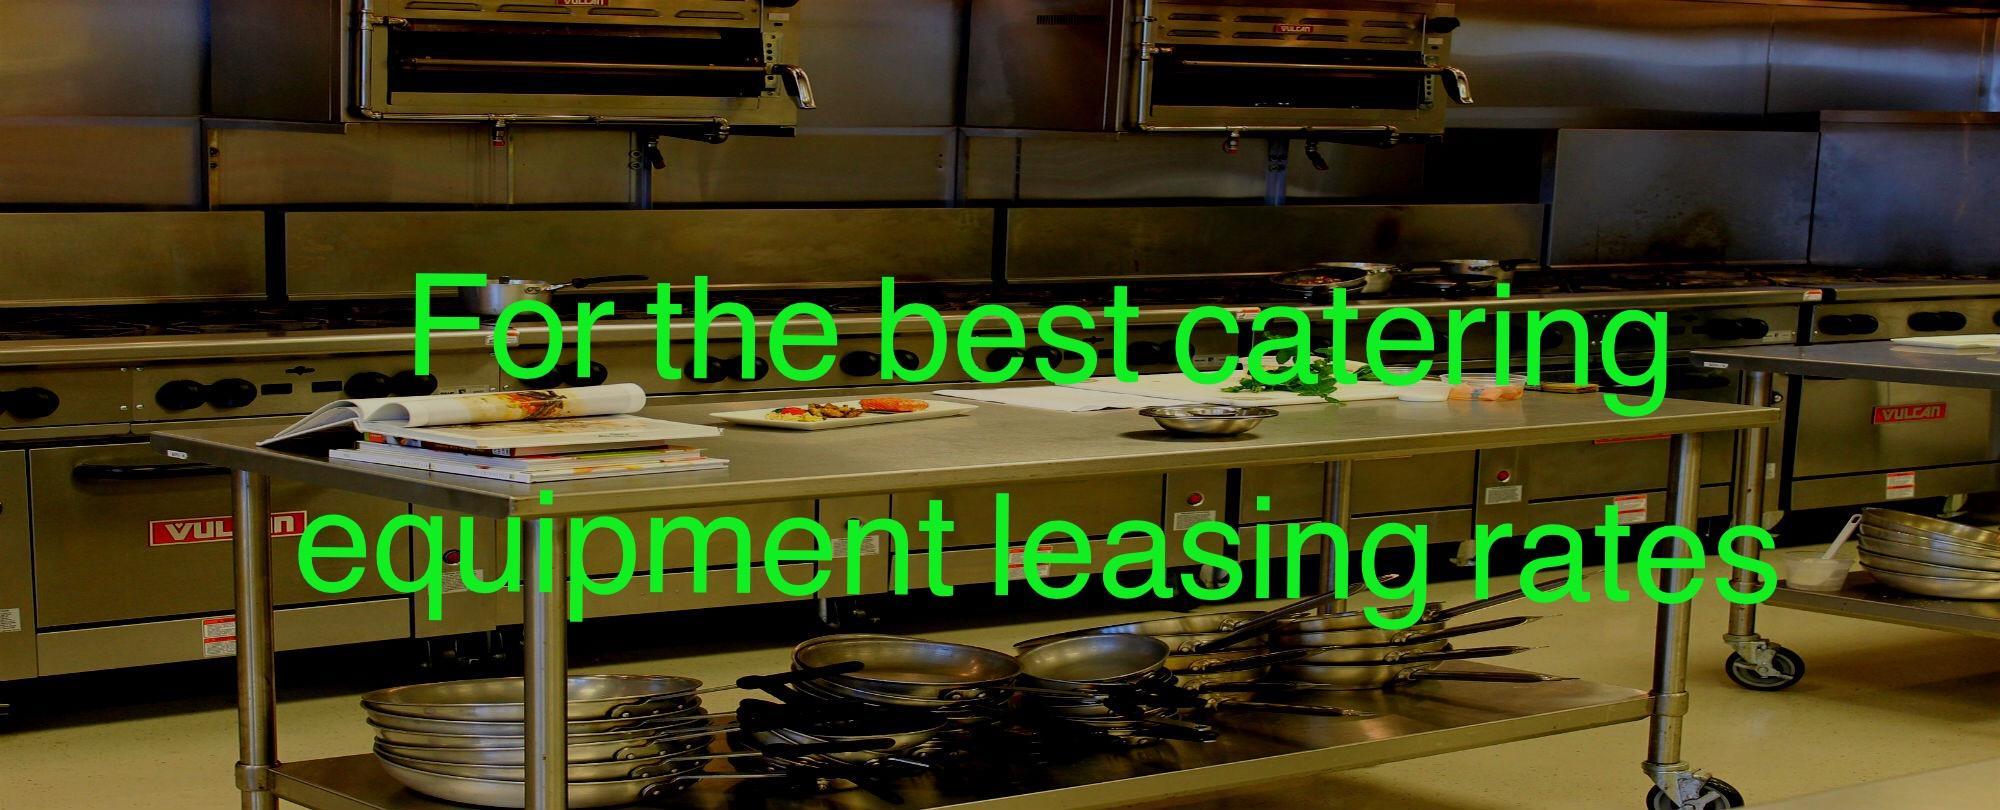 Leasing Kitchen Equipment Uk Dandk Organizer